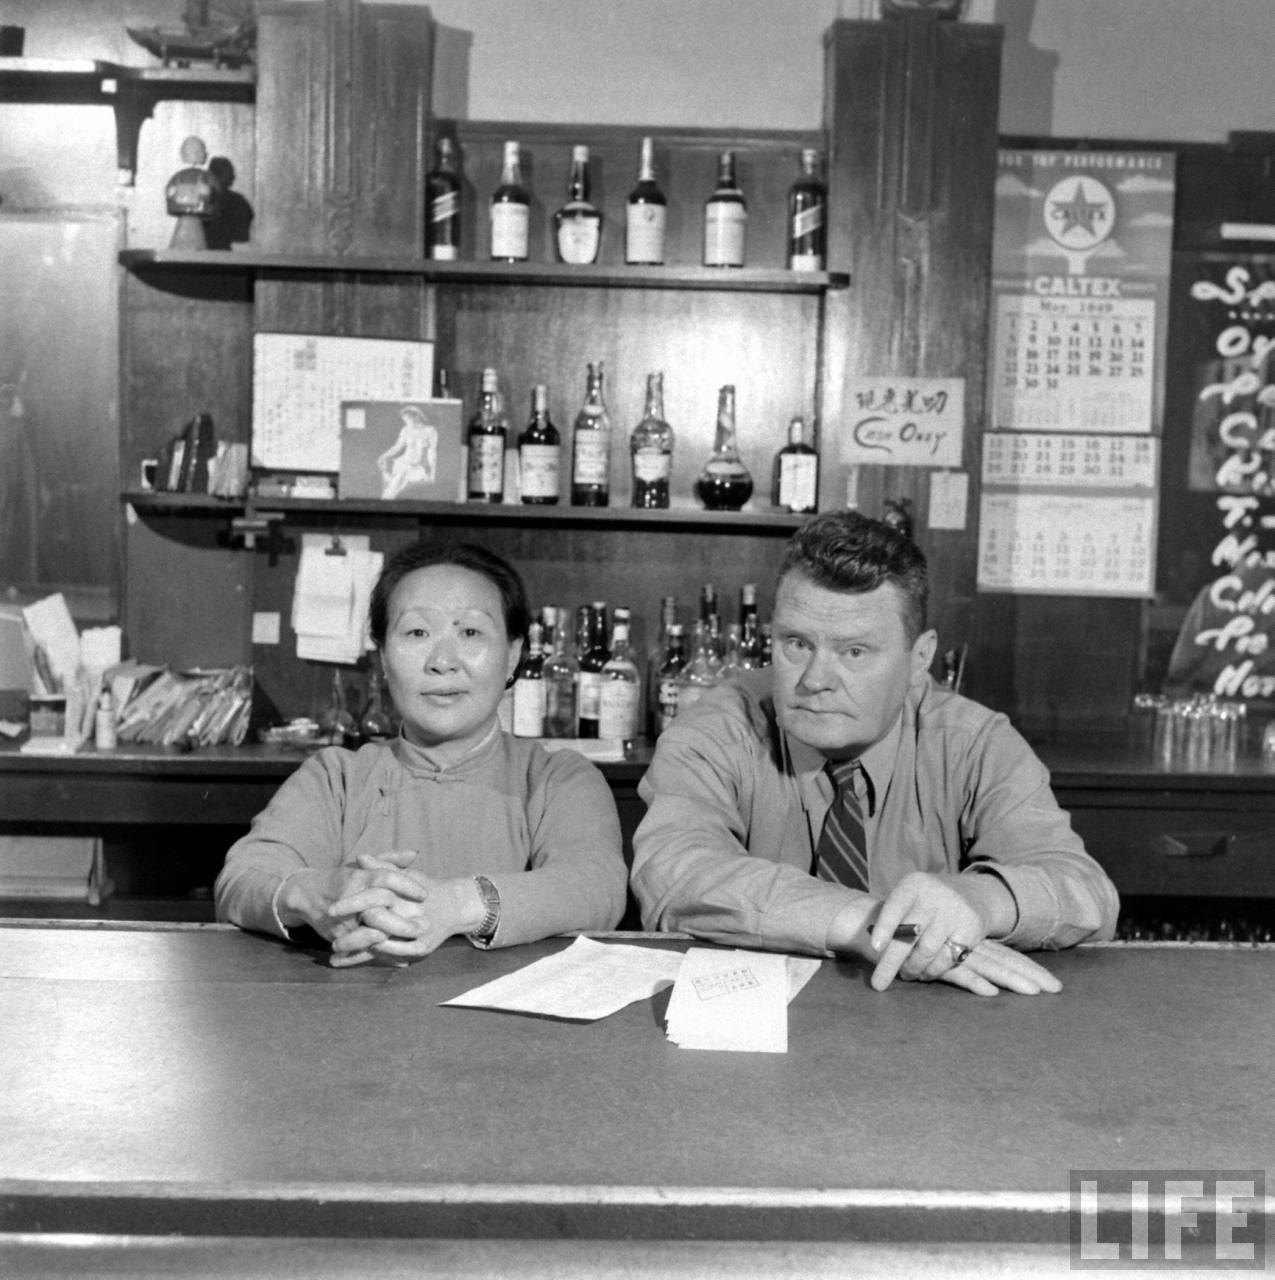 Daisy Gao Kia Kin and Frank Yenalevicz, New Ritz Bar, Shanghai, May 1949 by Jack Birns © Time Inc.